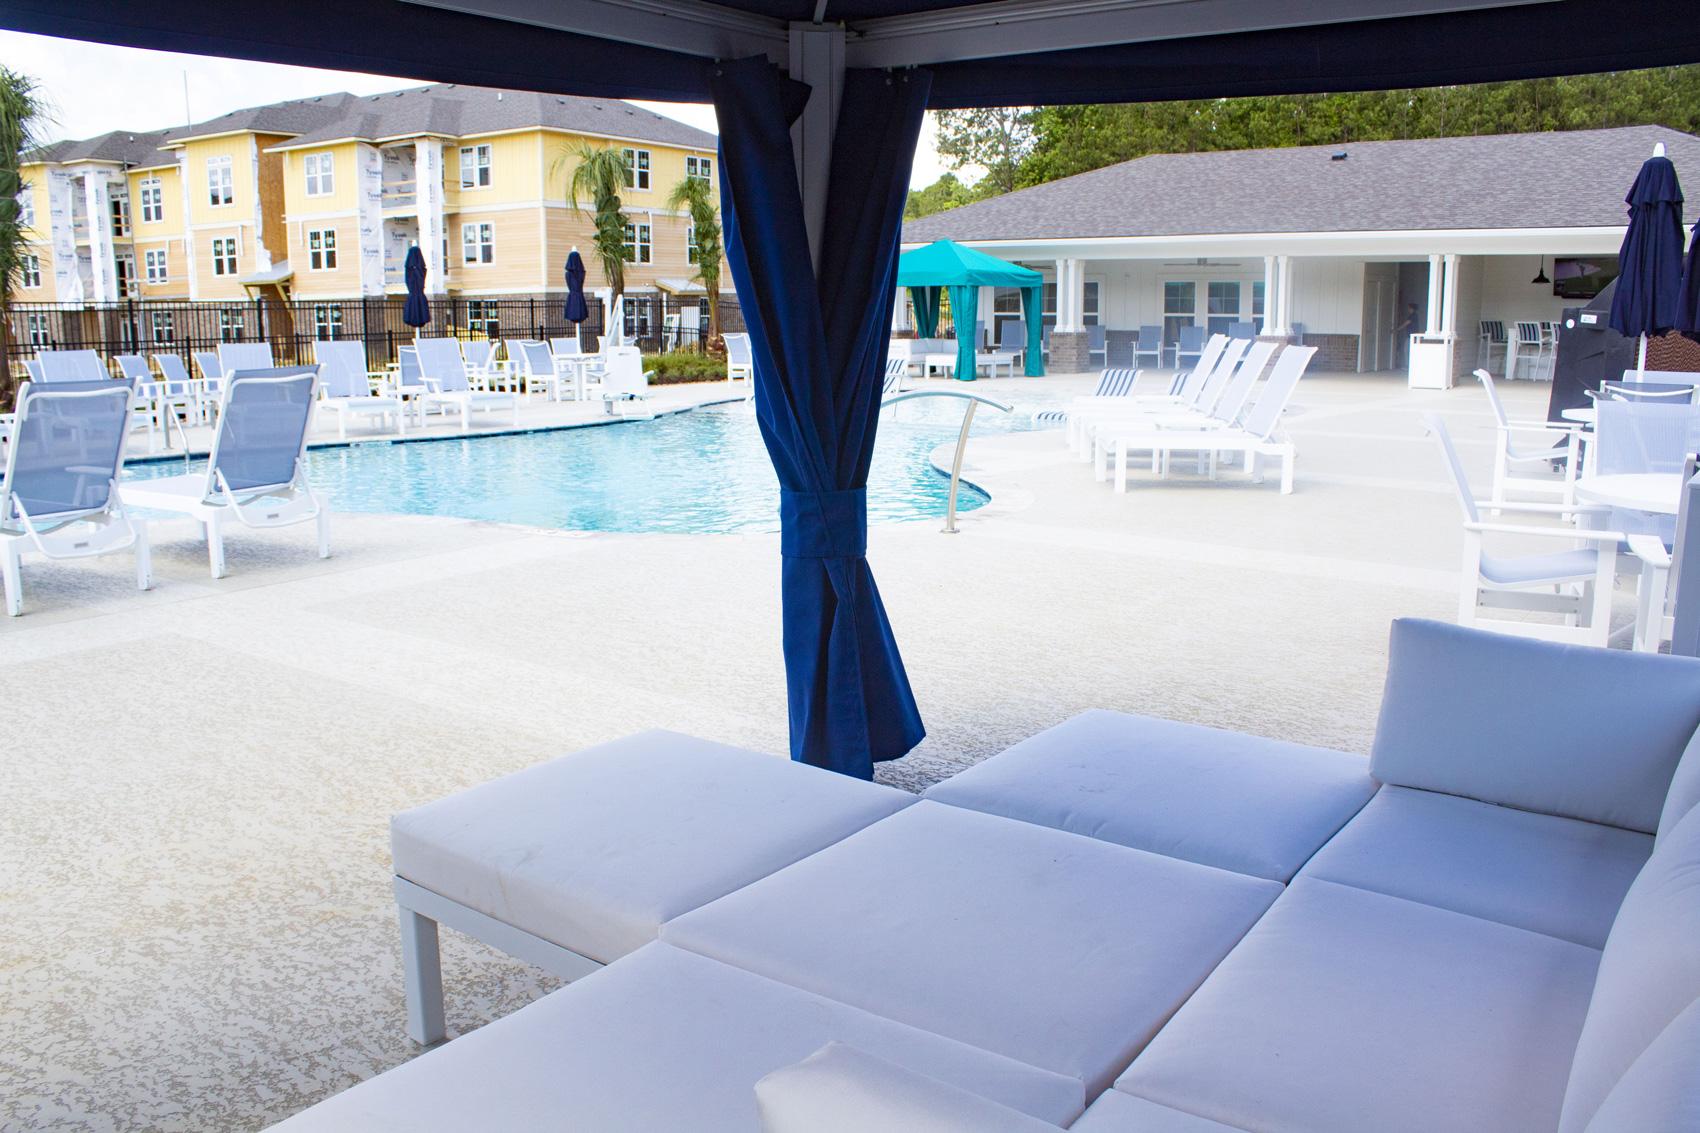 Shaded Poolside Areas at The Palms at Juban Lakes Apartments in Denham Springs, Louisiana